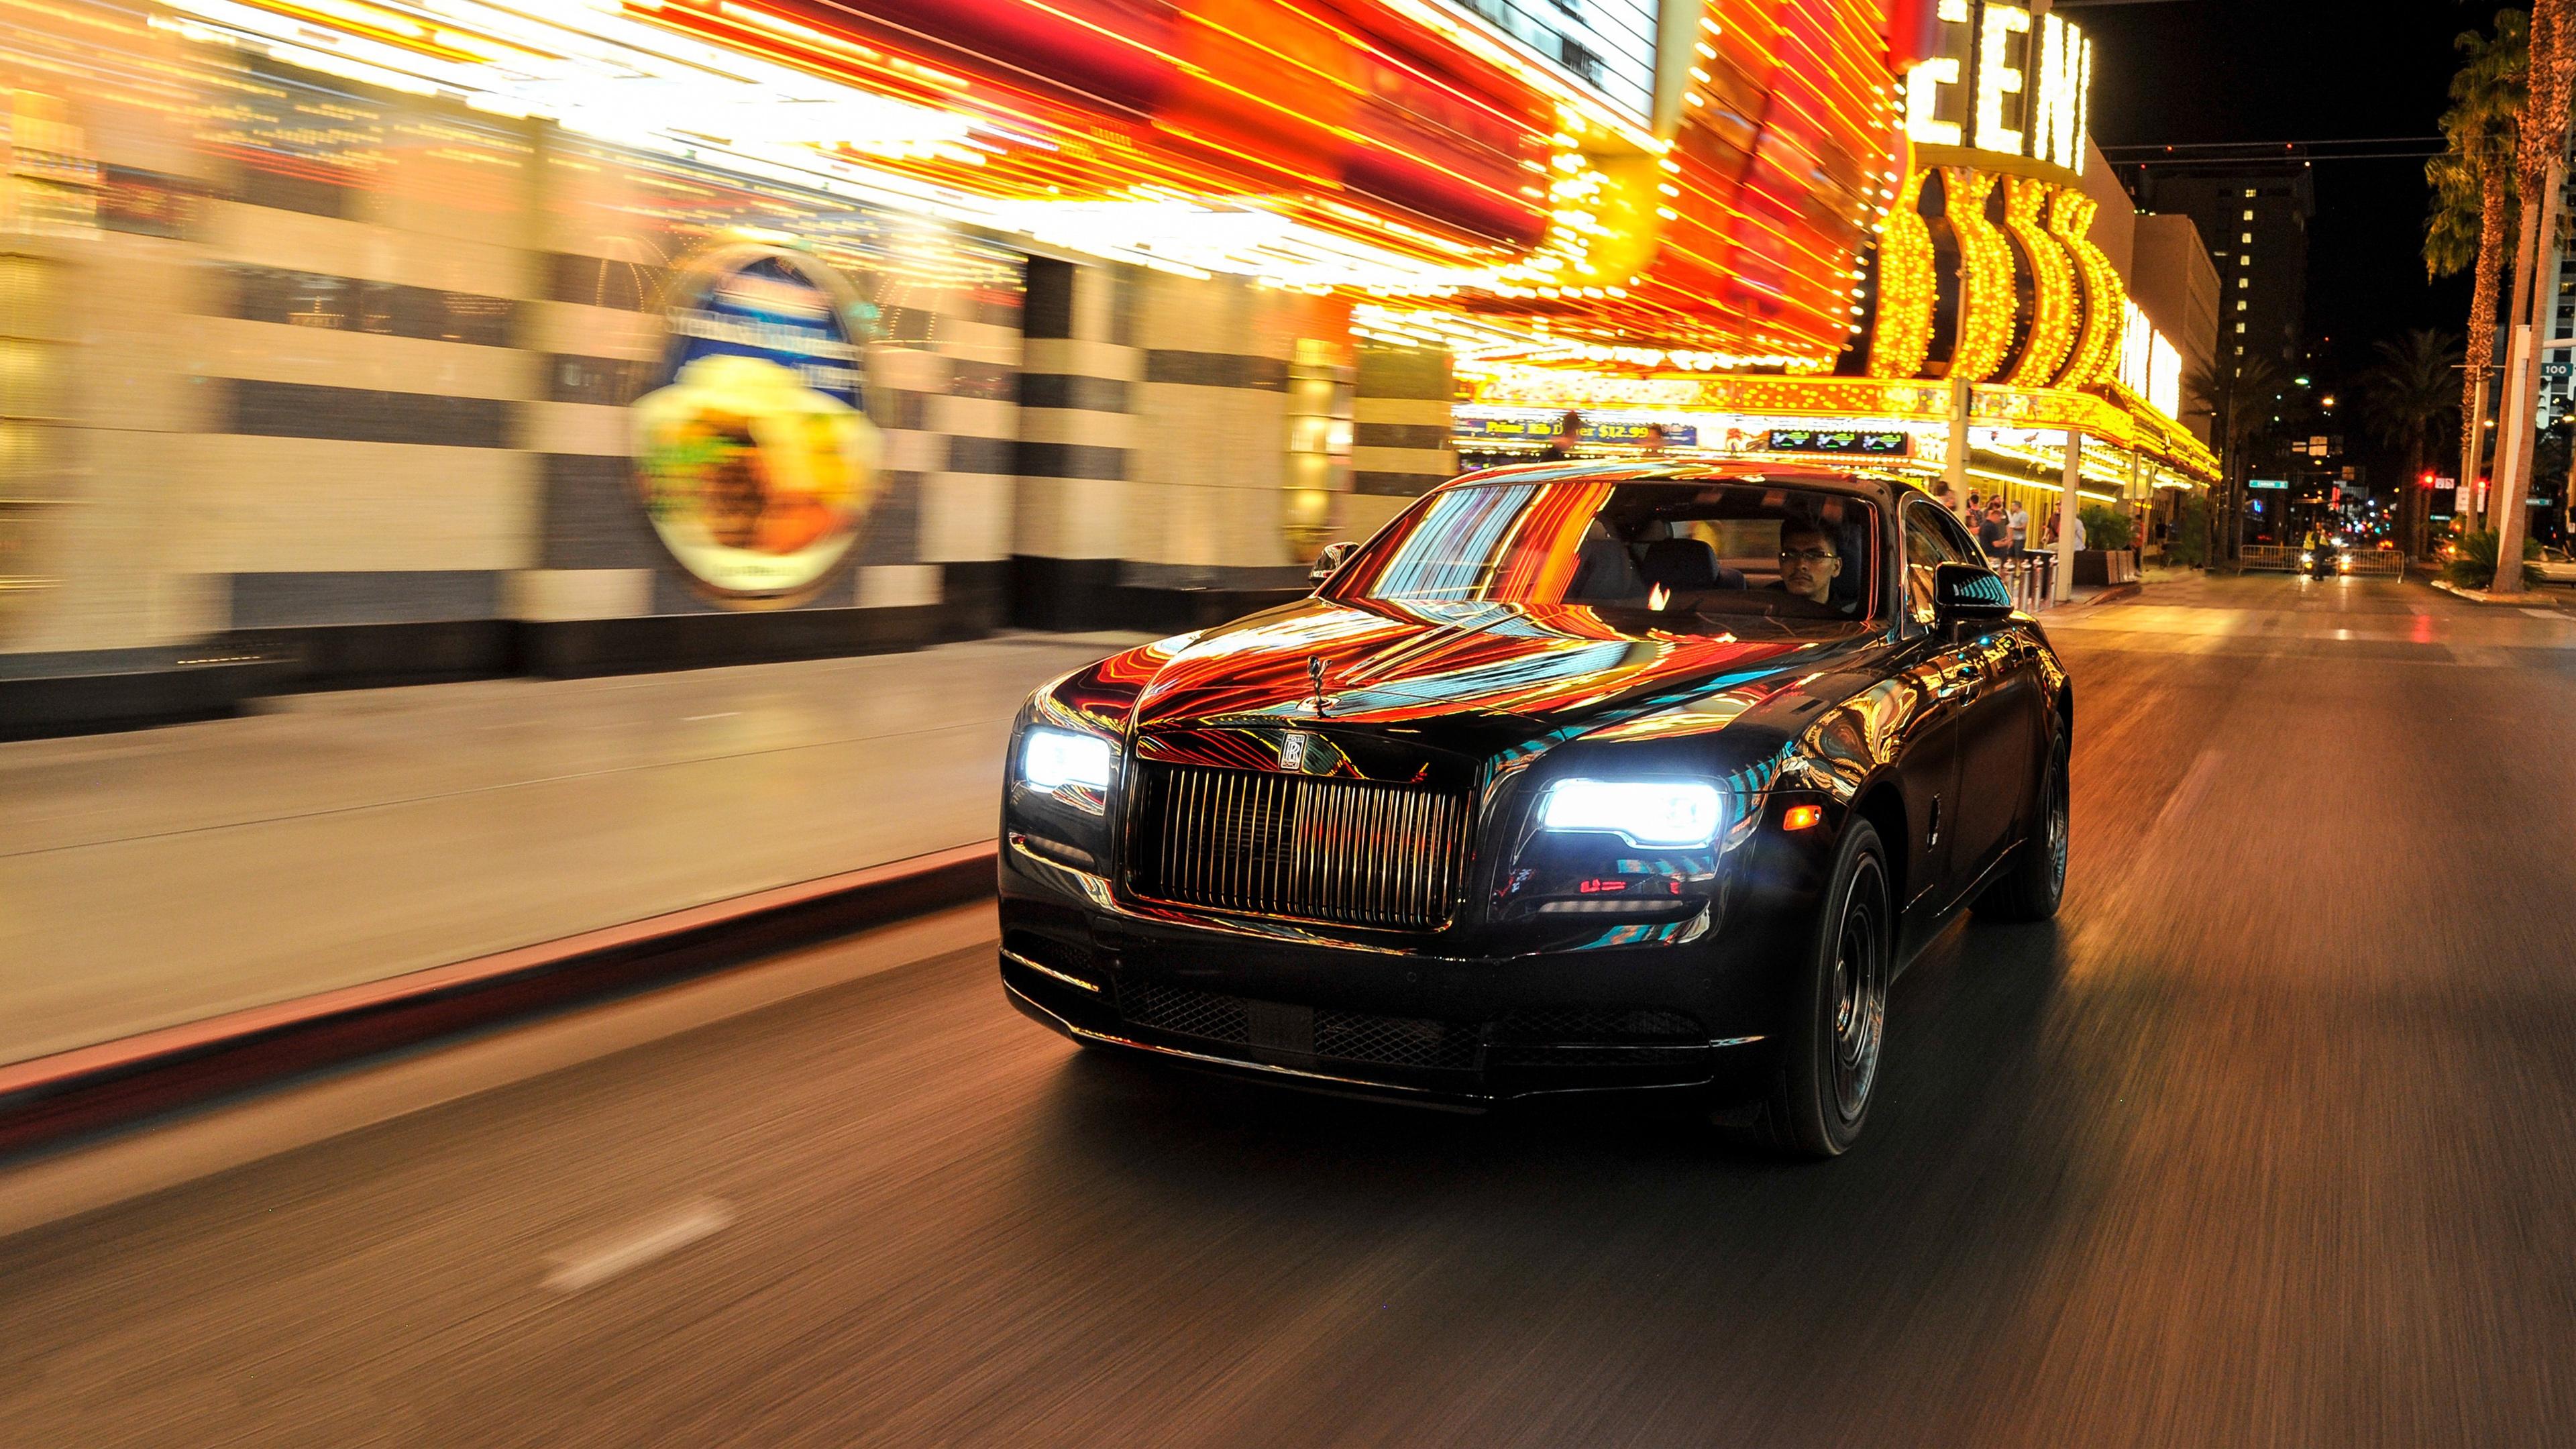 Rolls Royce Wraith Black Badge 4K 2017 Wallpaper | HD Car ...